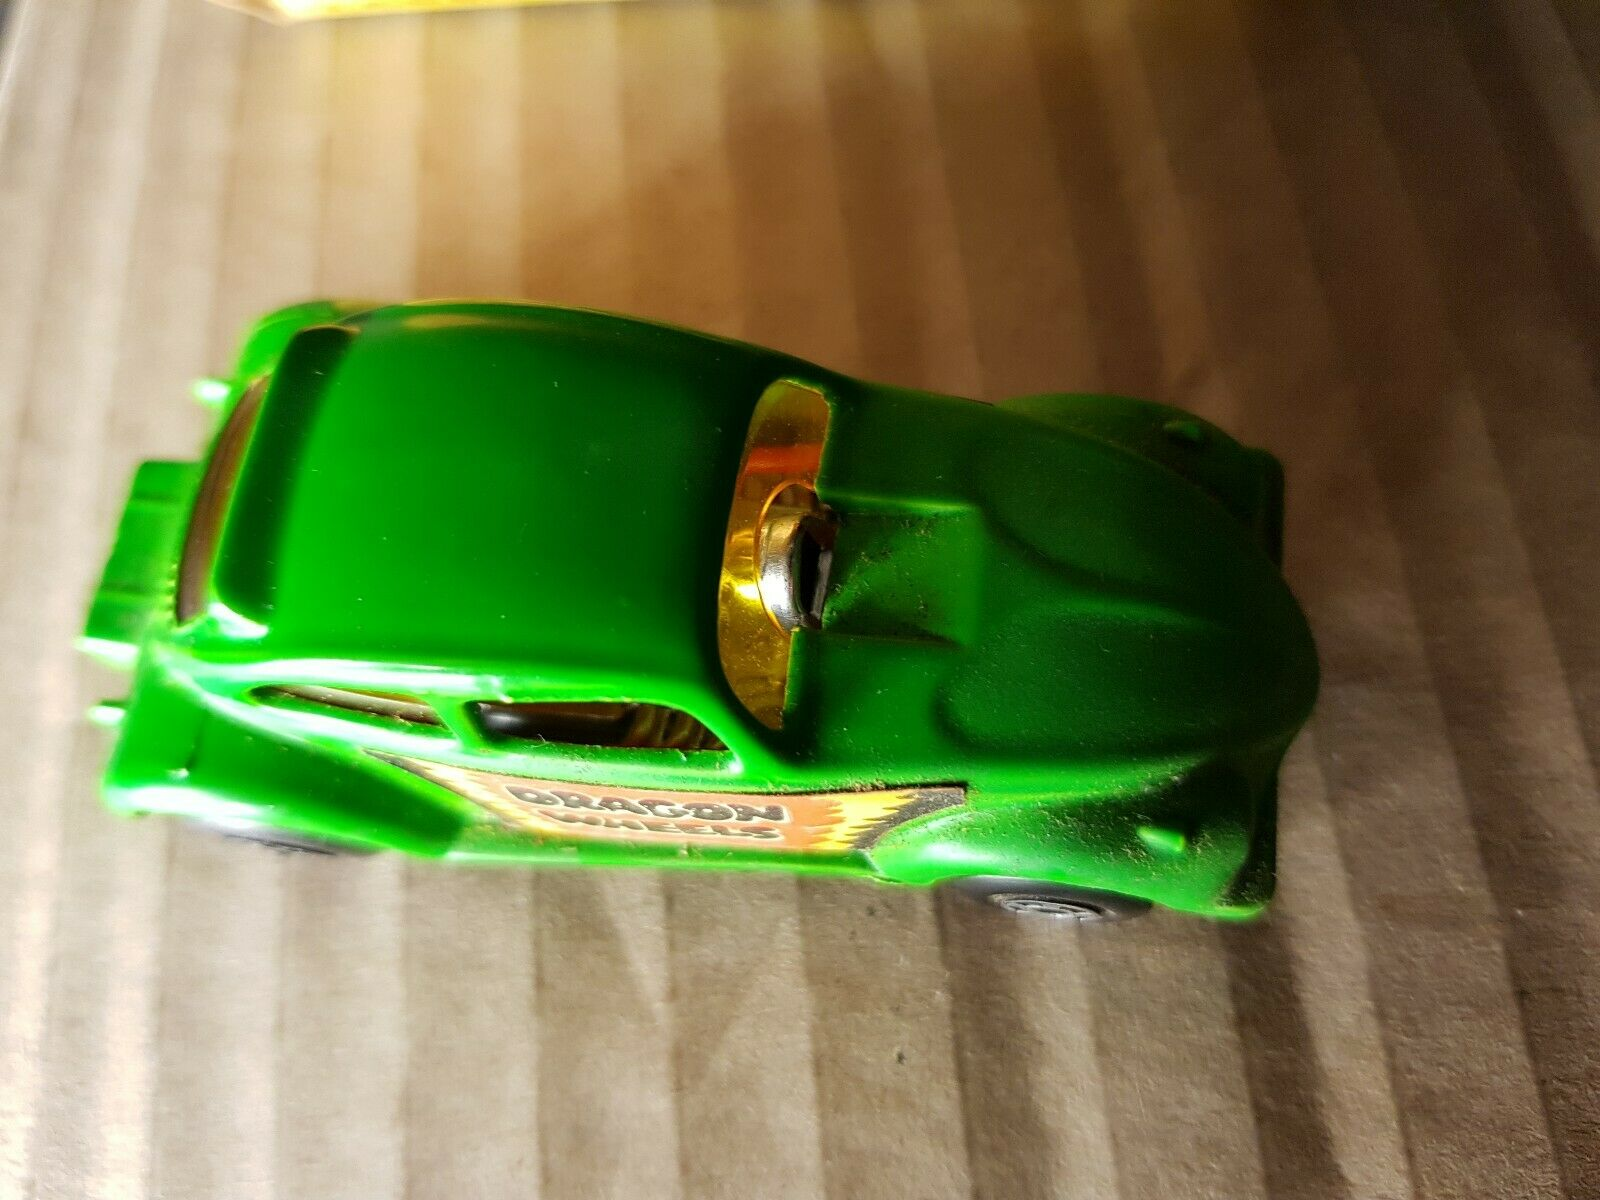 Matchbox VW Dragon Wheels Car - - - Vintage 1972 Green Volkswagon Lesney England car 19c2b8